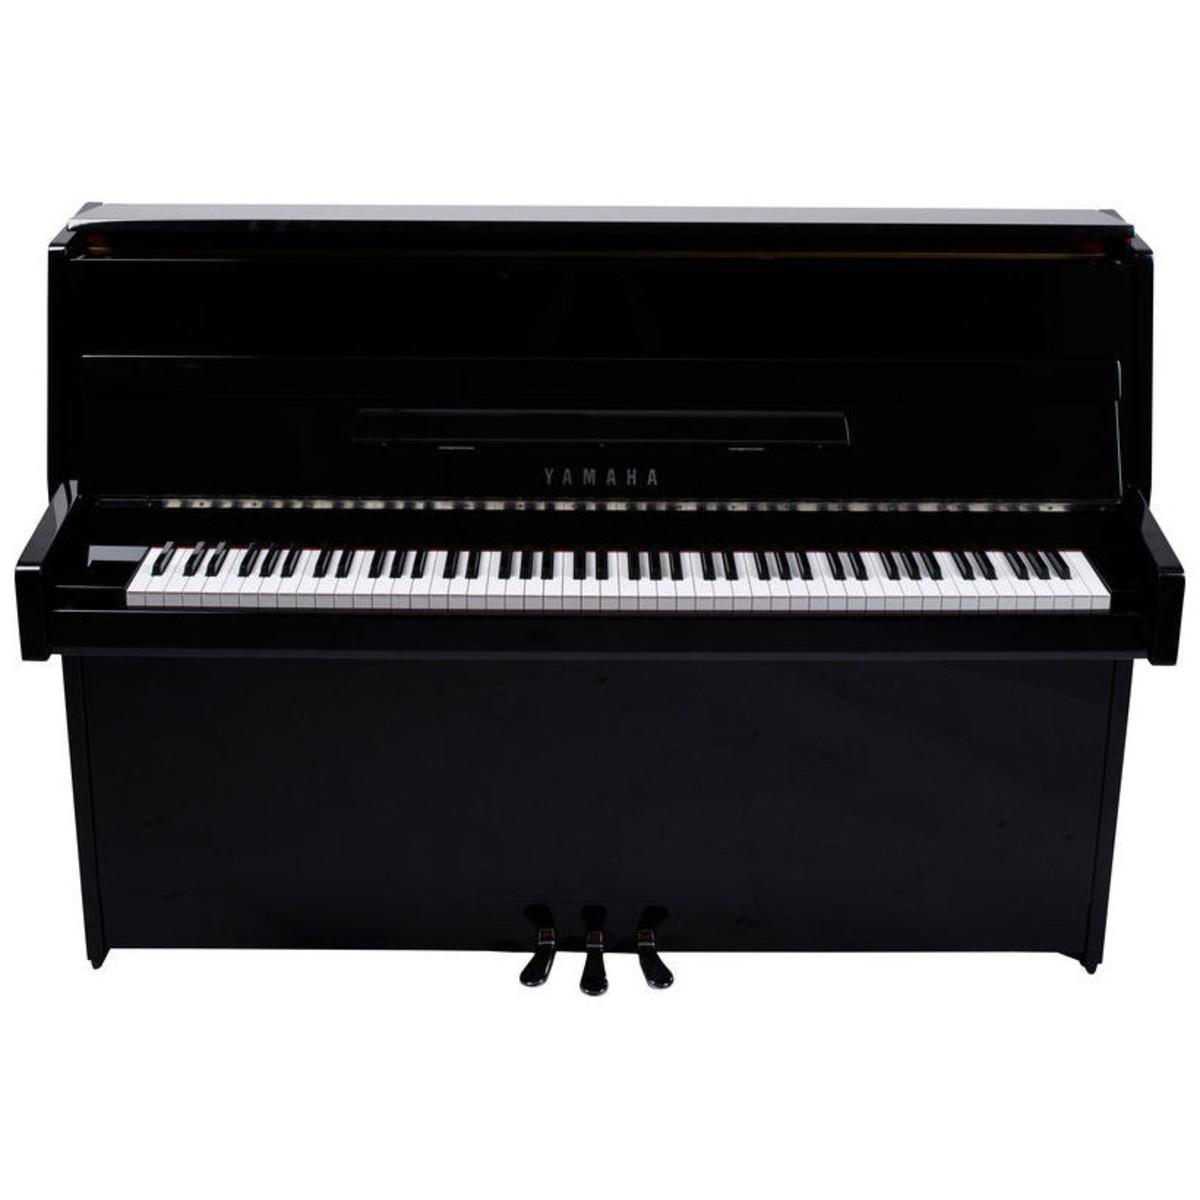 yamaha b1 upright acoustic piano polished ebony chrome fittings at. Black Bedroom Furniture Sets. Home Design Ideas